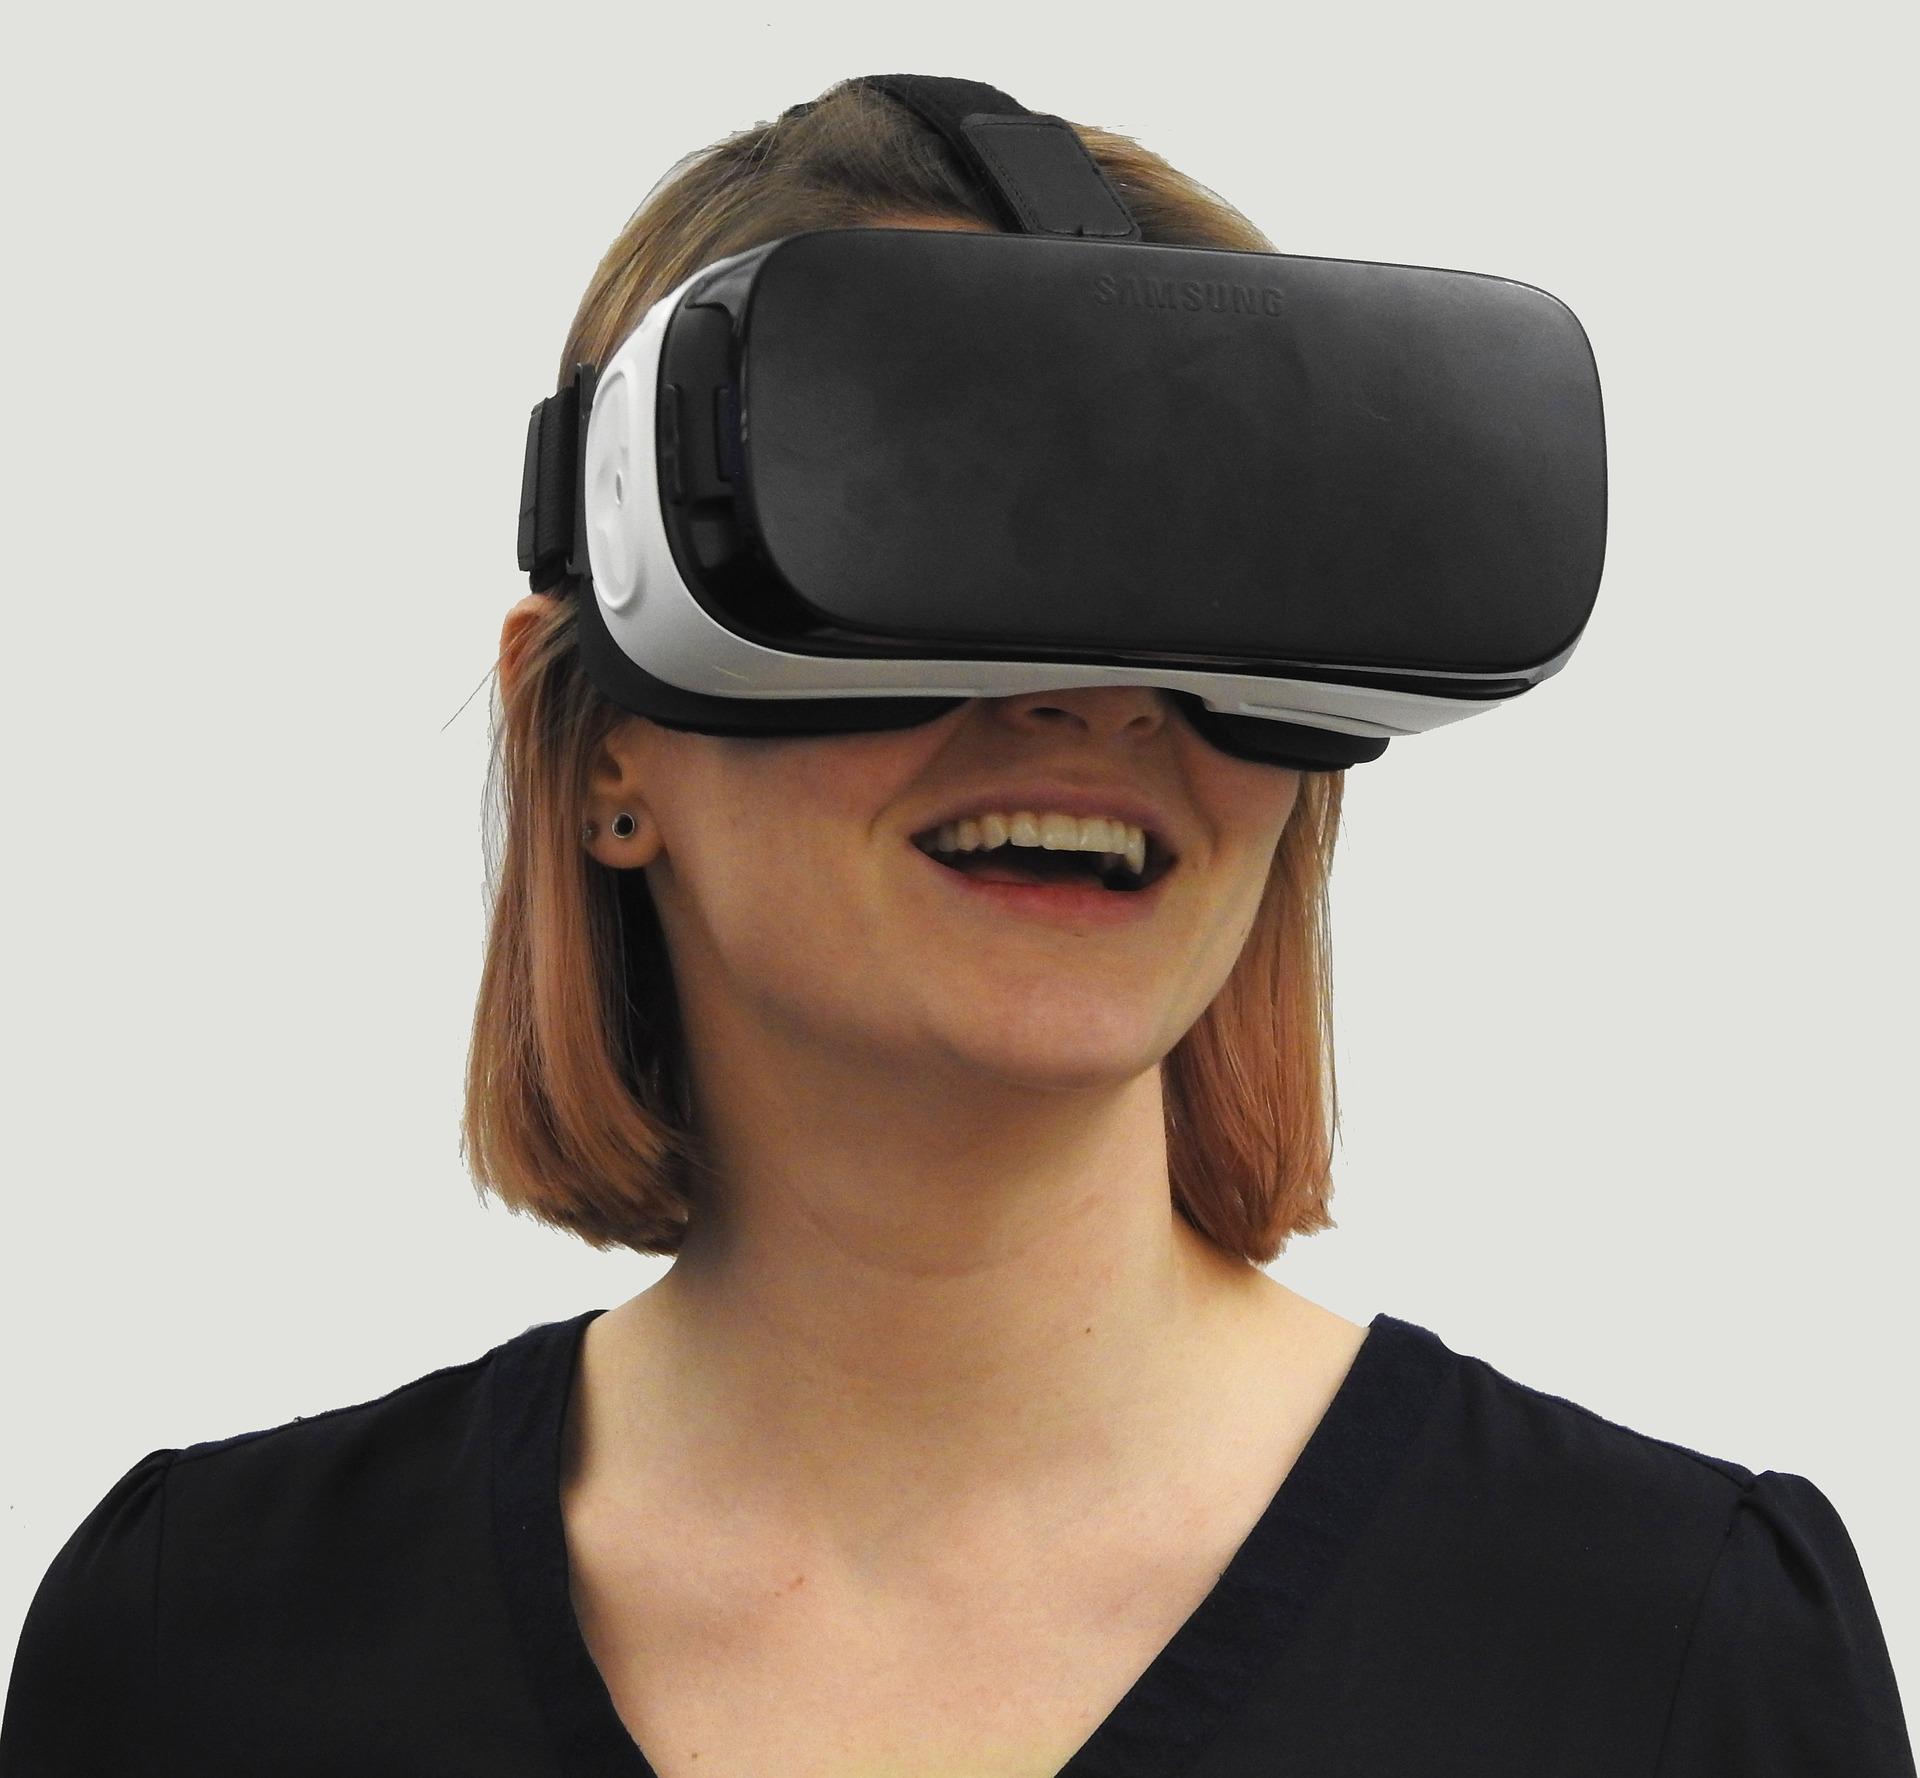 Frau mit VR-Brille.